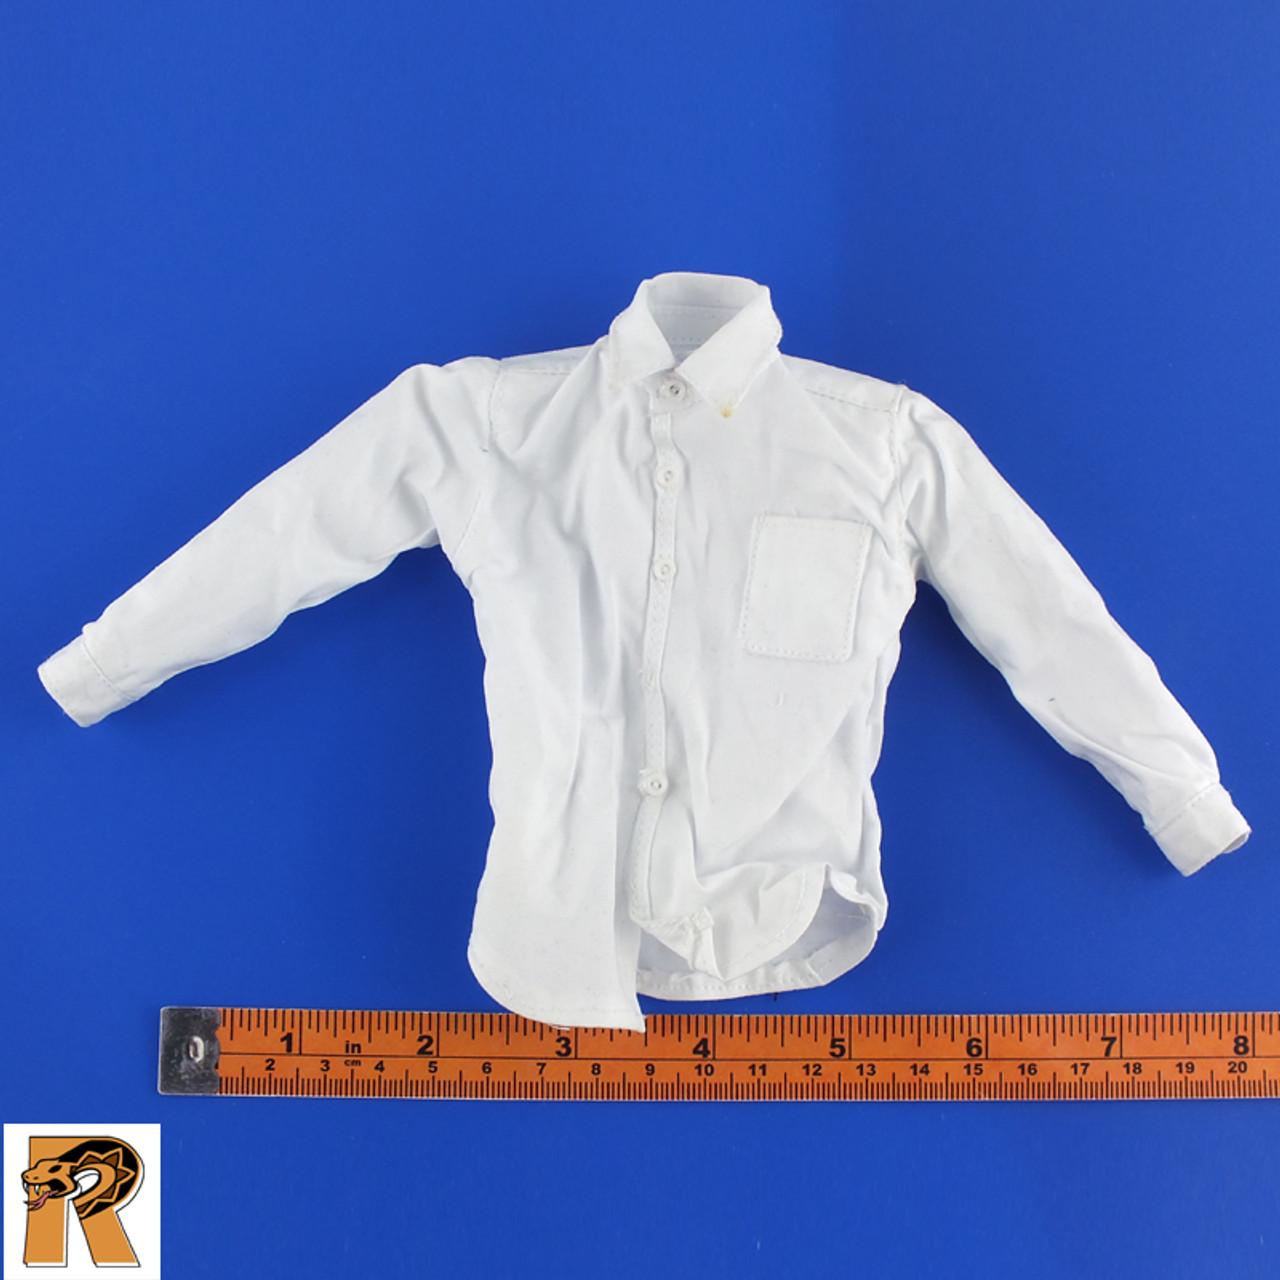 Obama - White Dress Shirt - 1/6 Scale